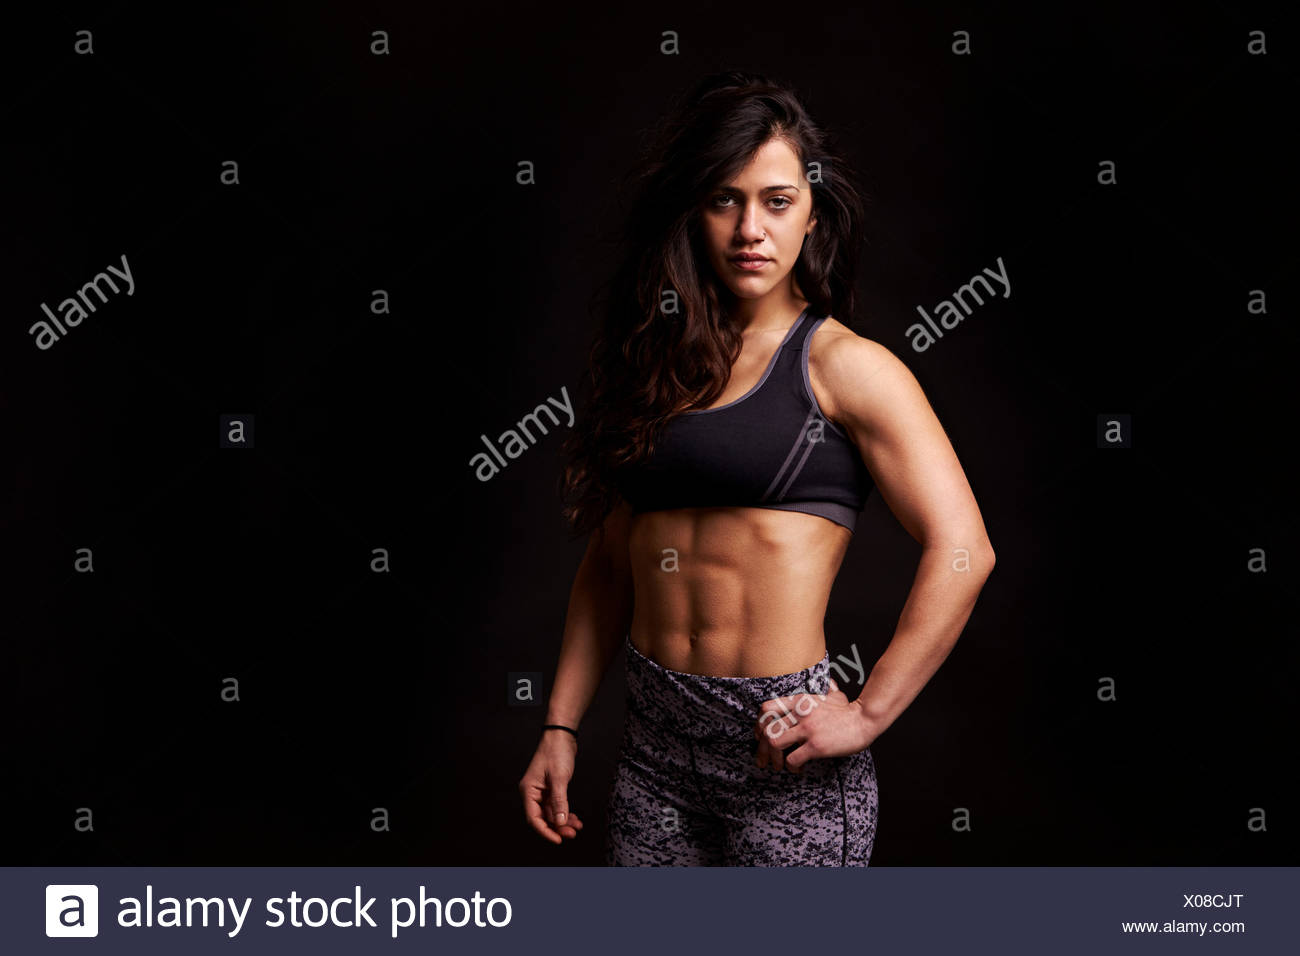 Cintura para arriba retrato de mujer joven morenaza muscular Imagen De Stock